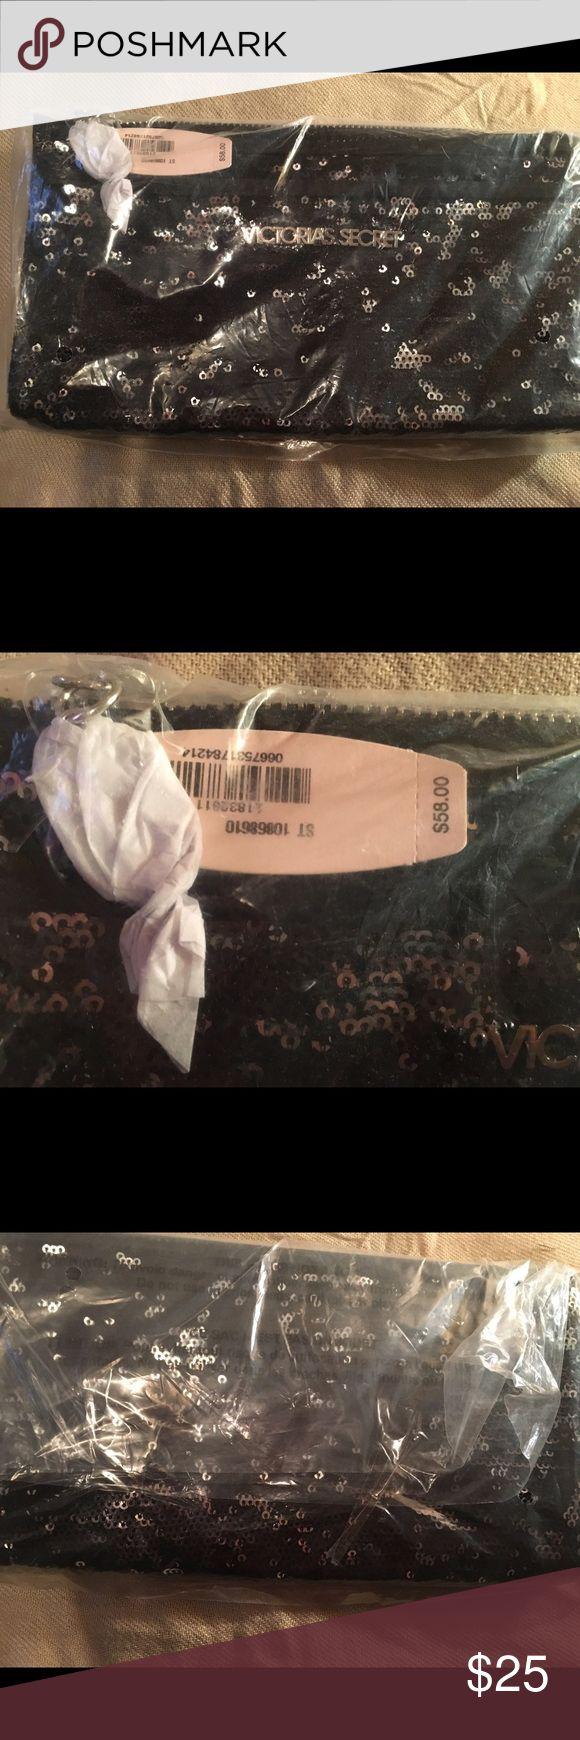 Victoria secret black sequin clutch bag Black sequin clutch bag by Victoria secret. New/never opened. Victoria's Secret Bags Clutches & Wristlets